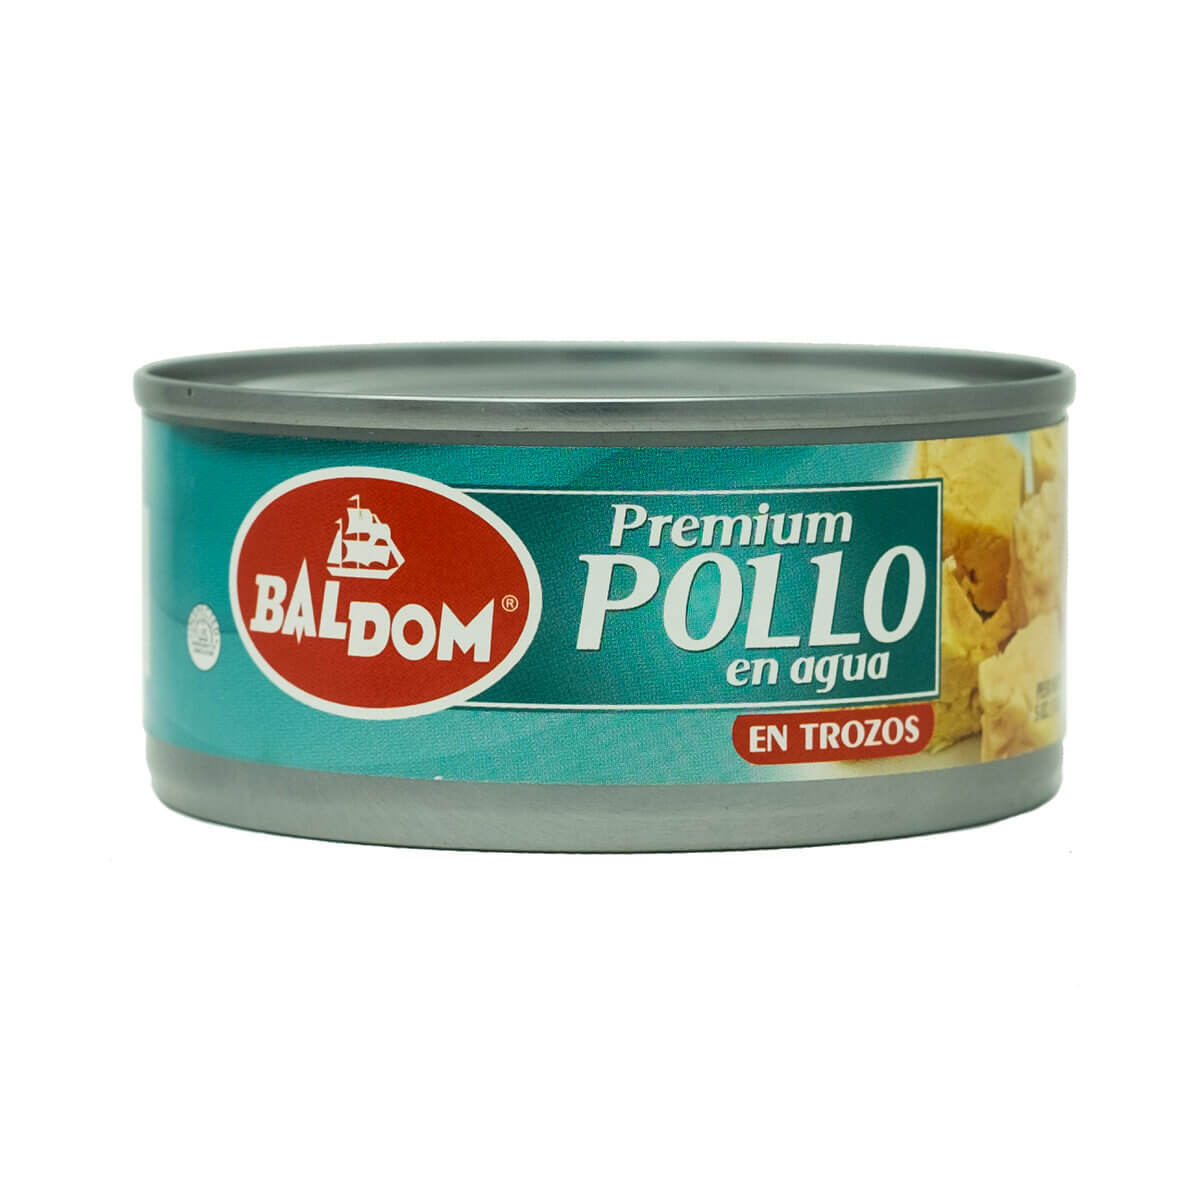 Premium Pollo en Trozos